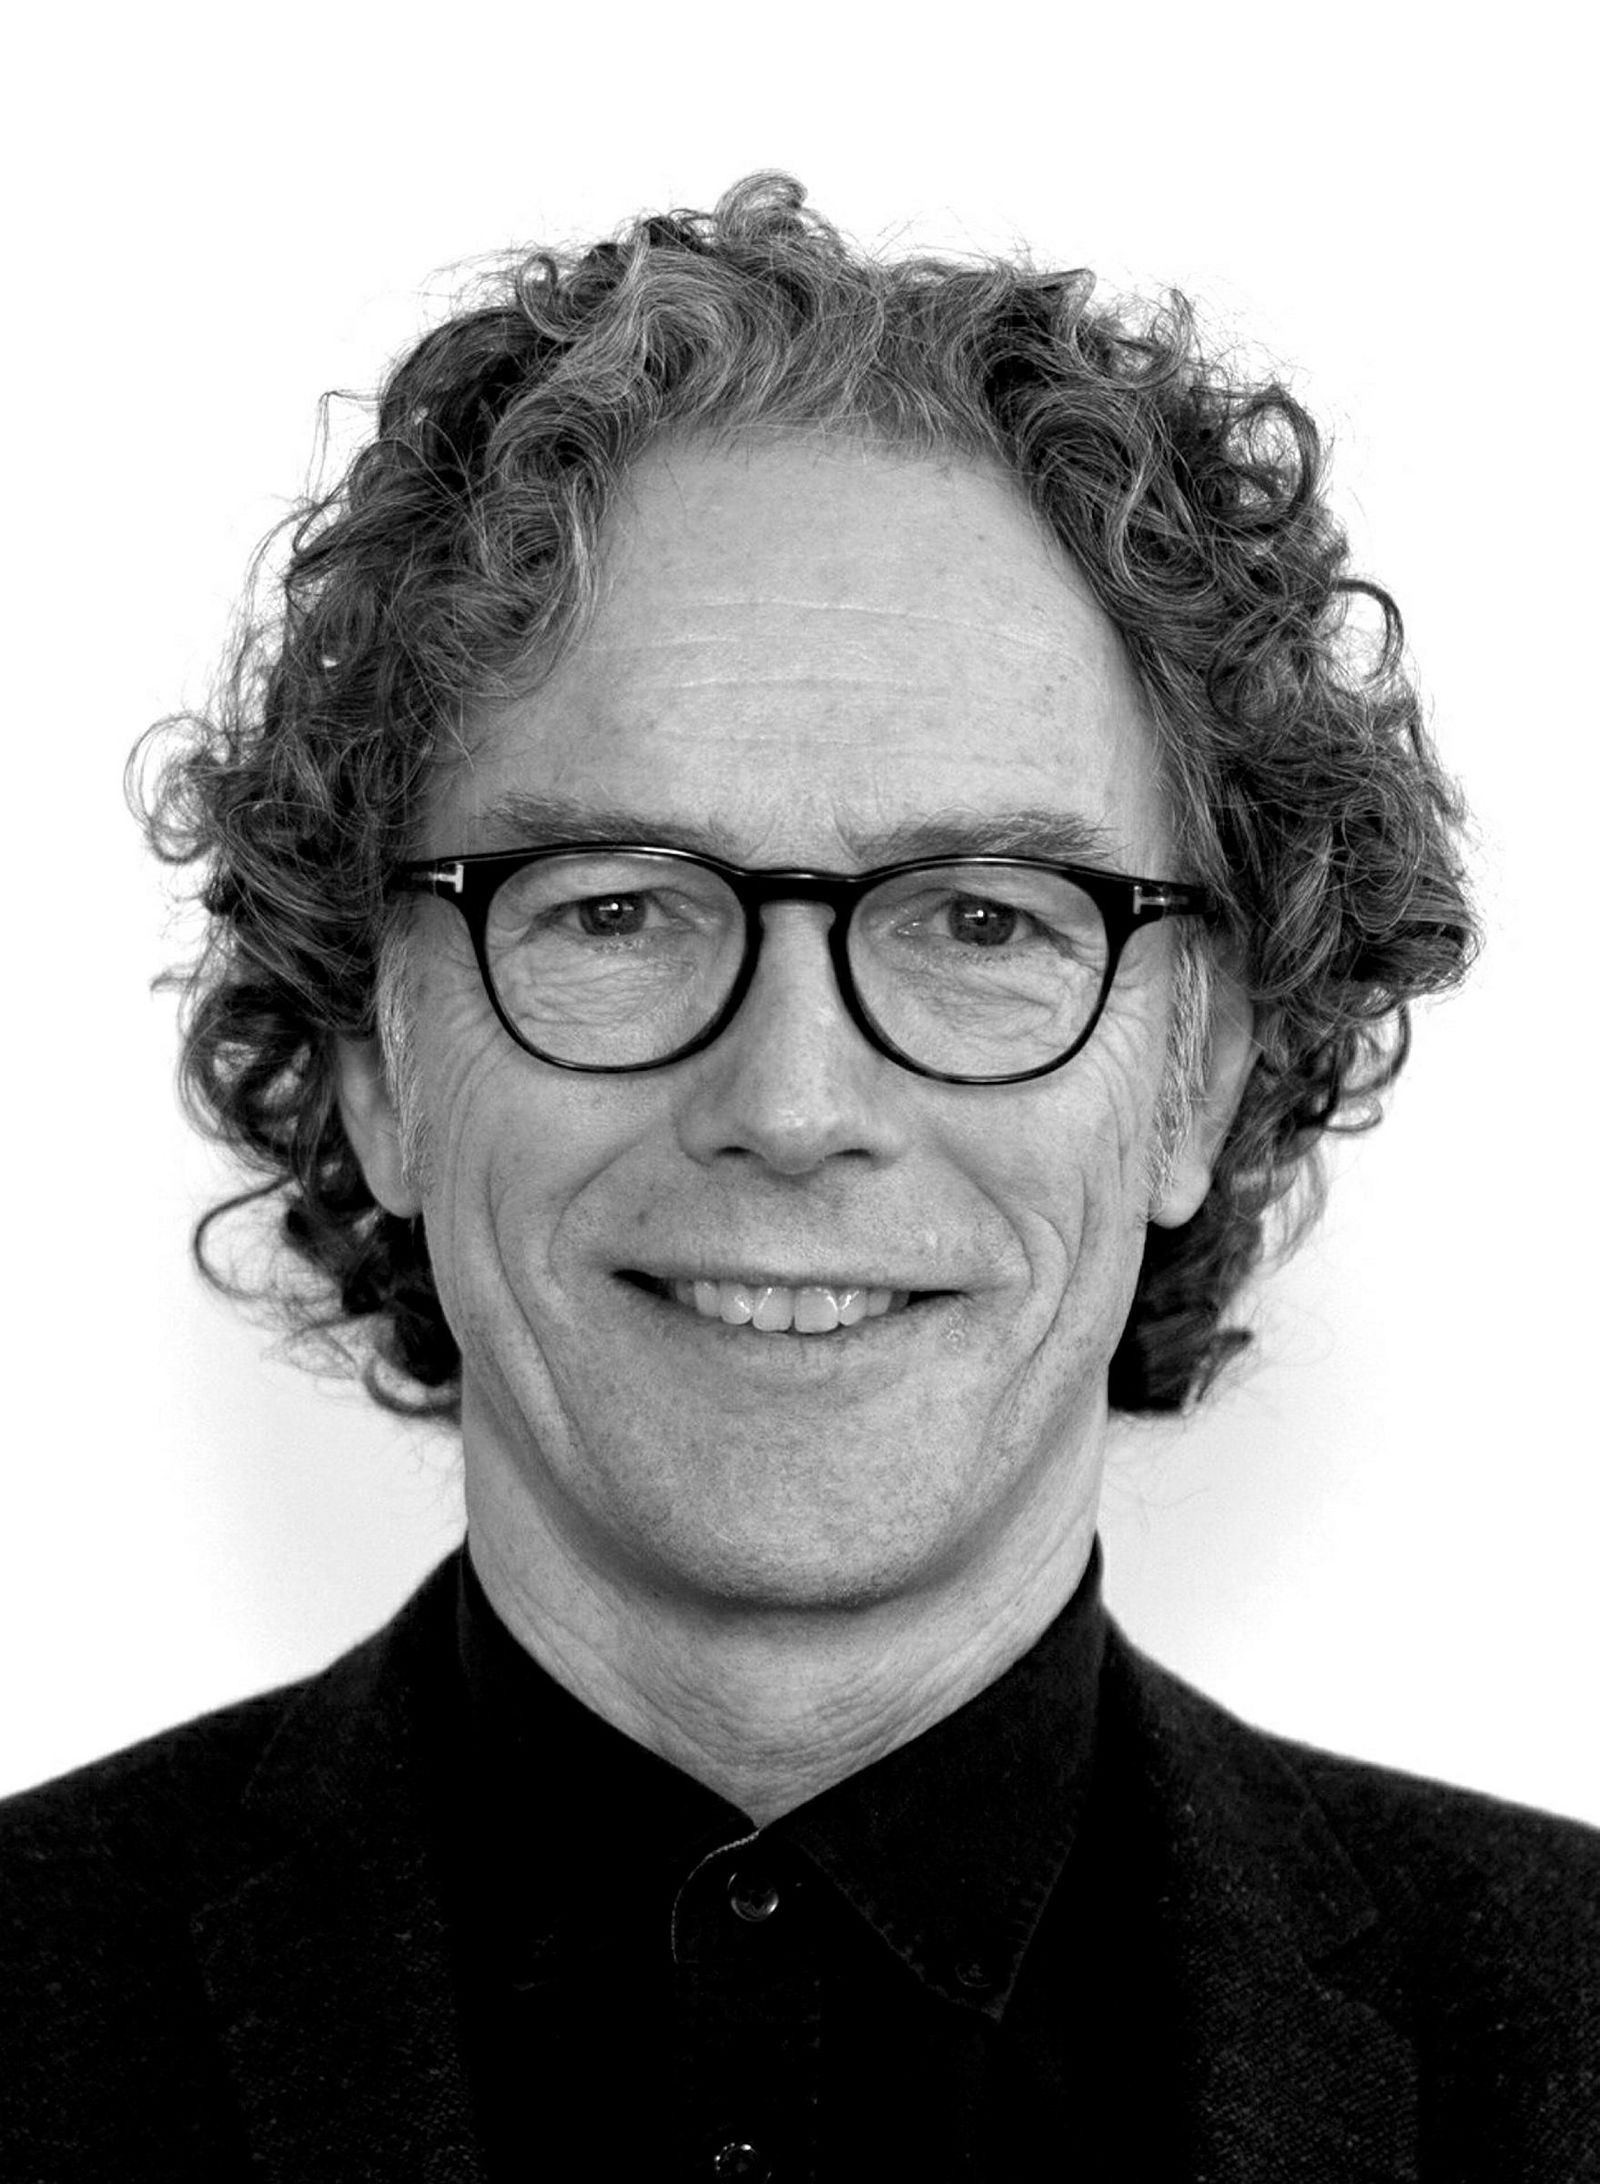 Knut Inge Klepp